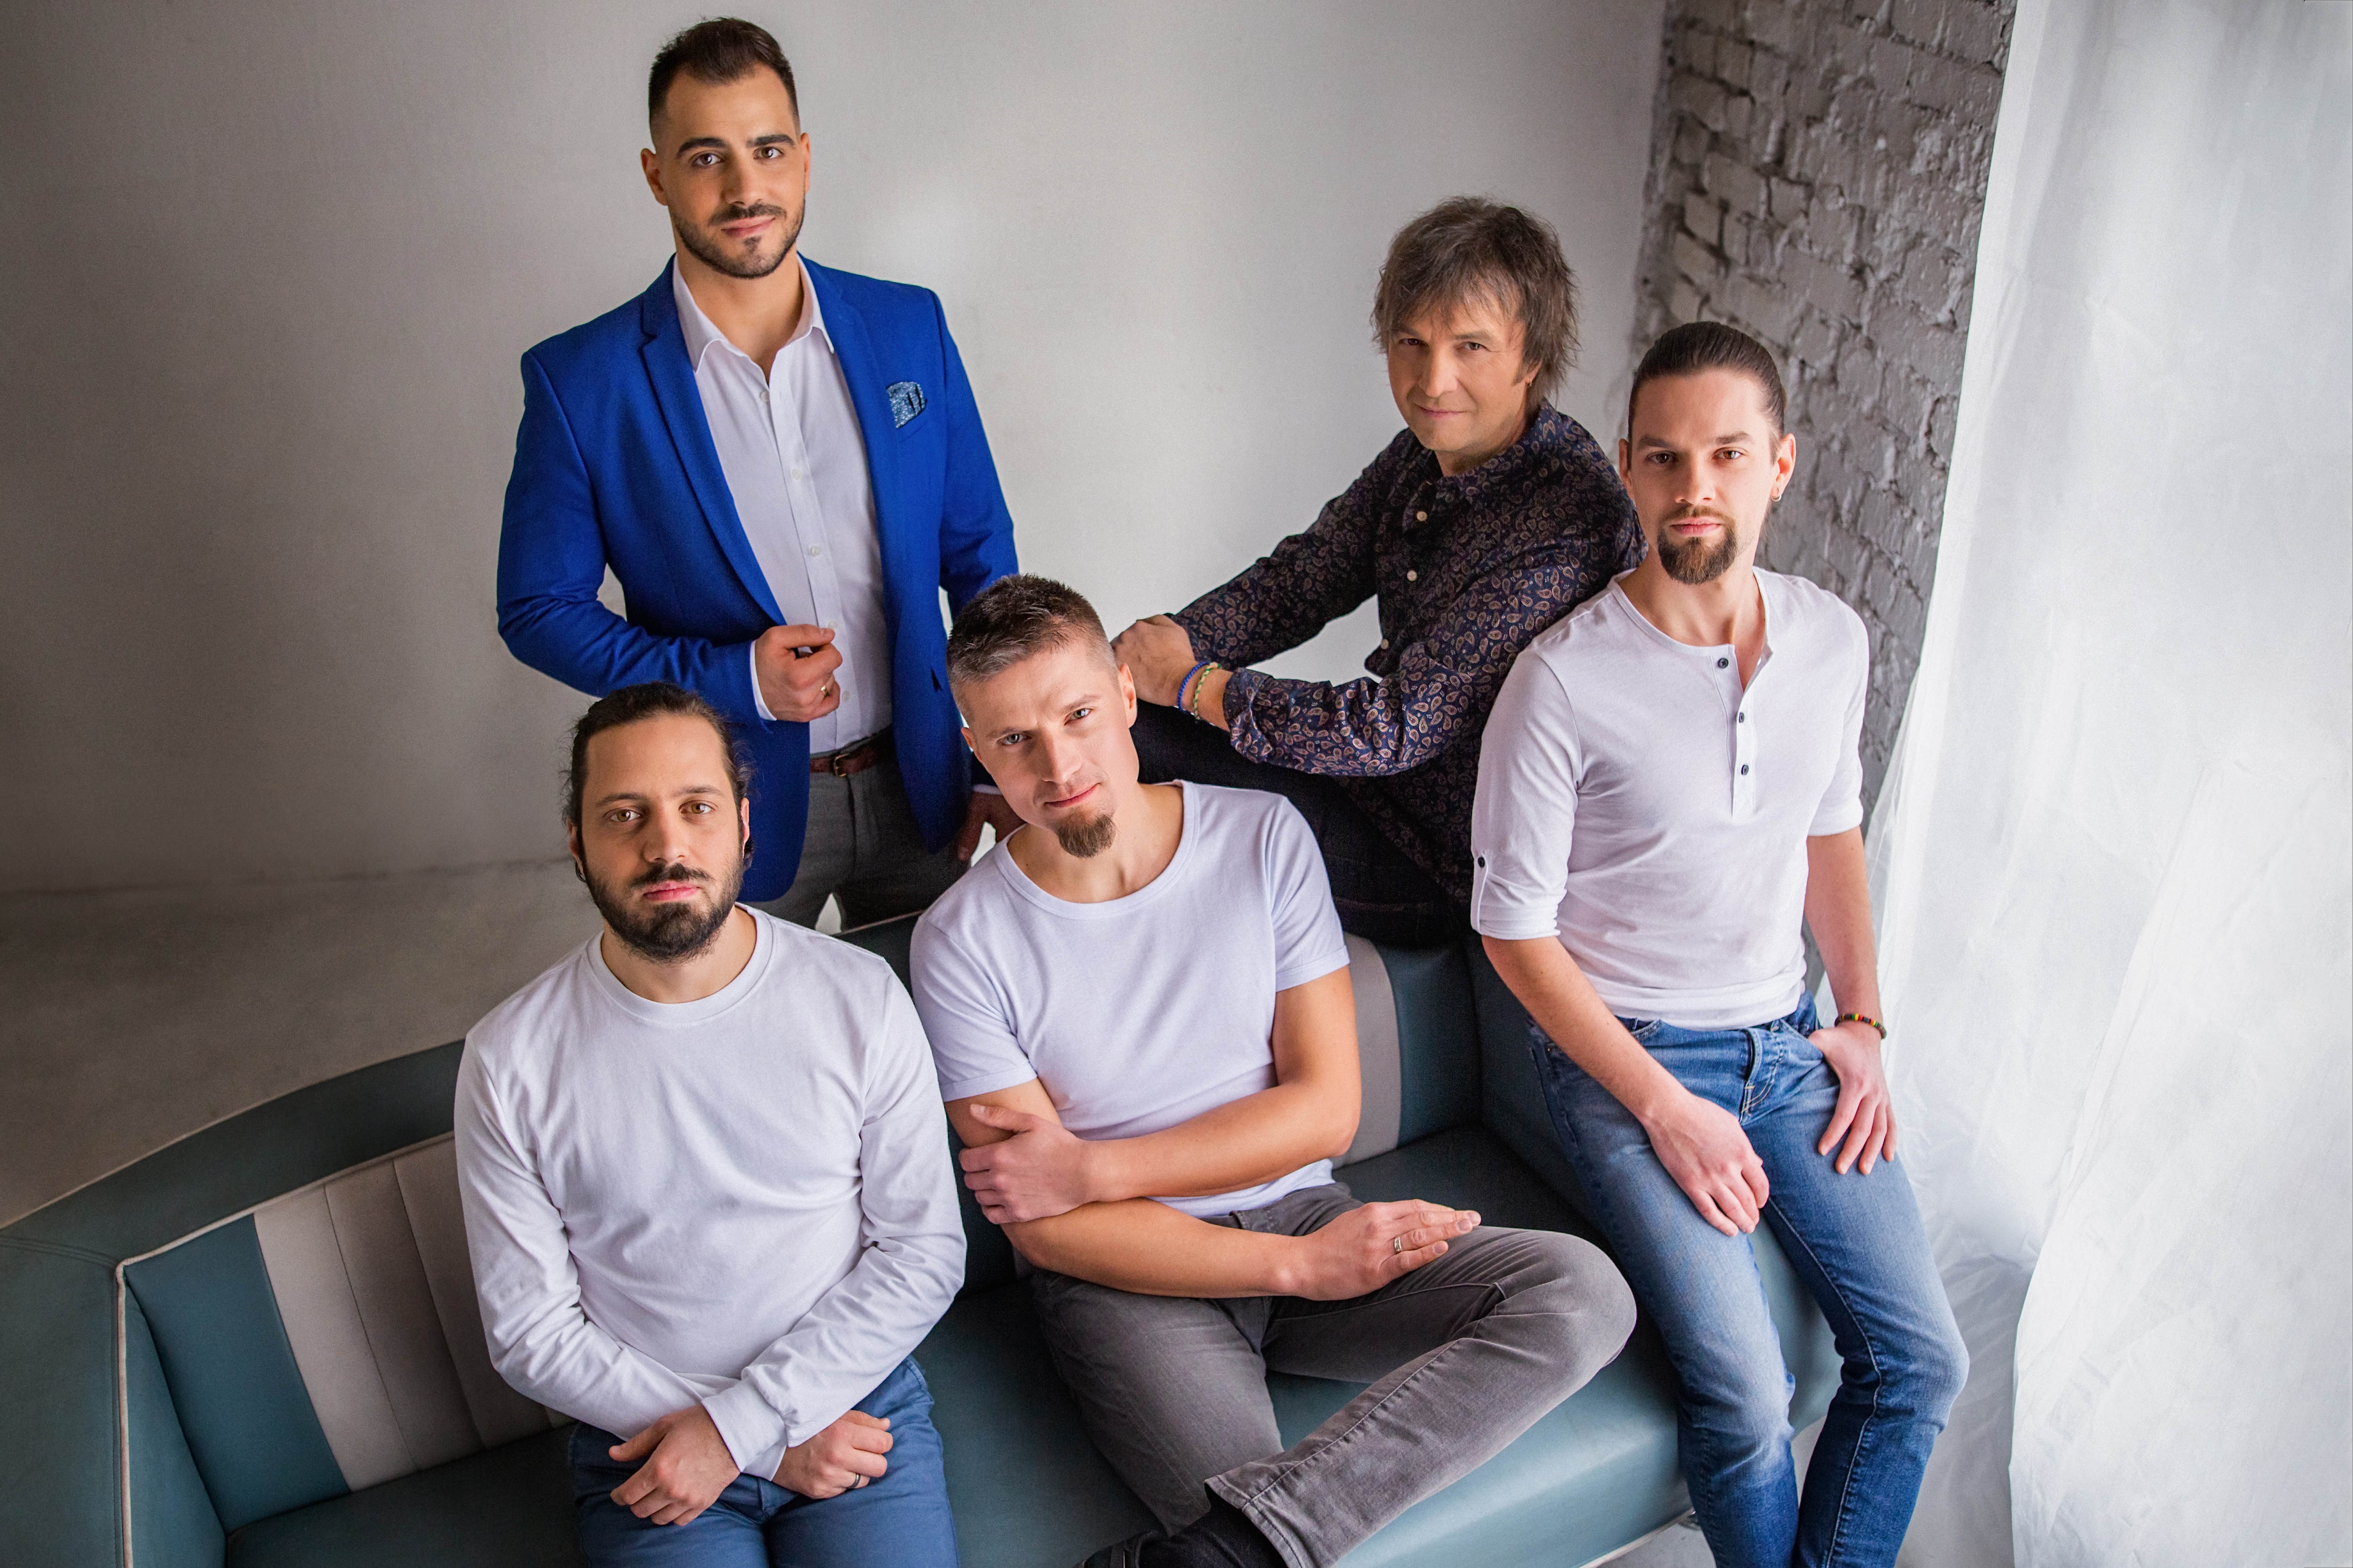 wigama_lekko_band_2019.jpg